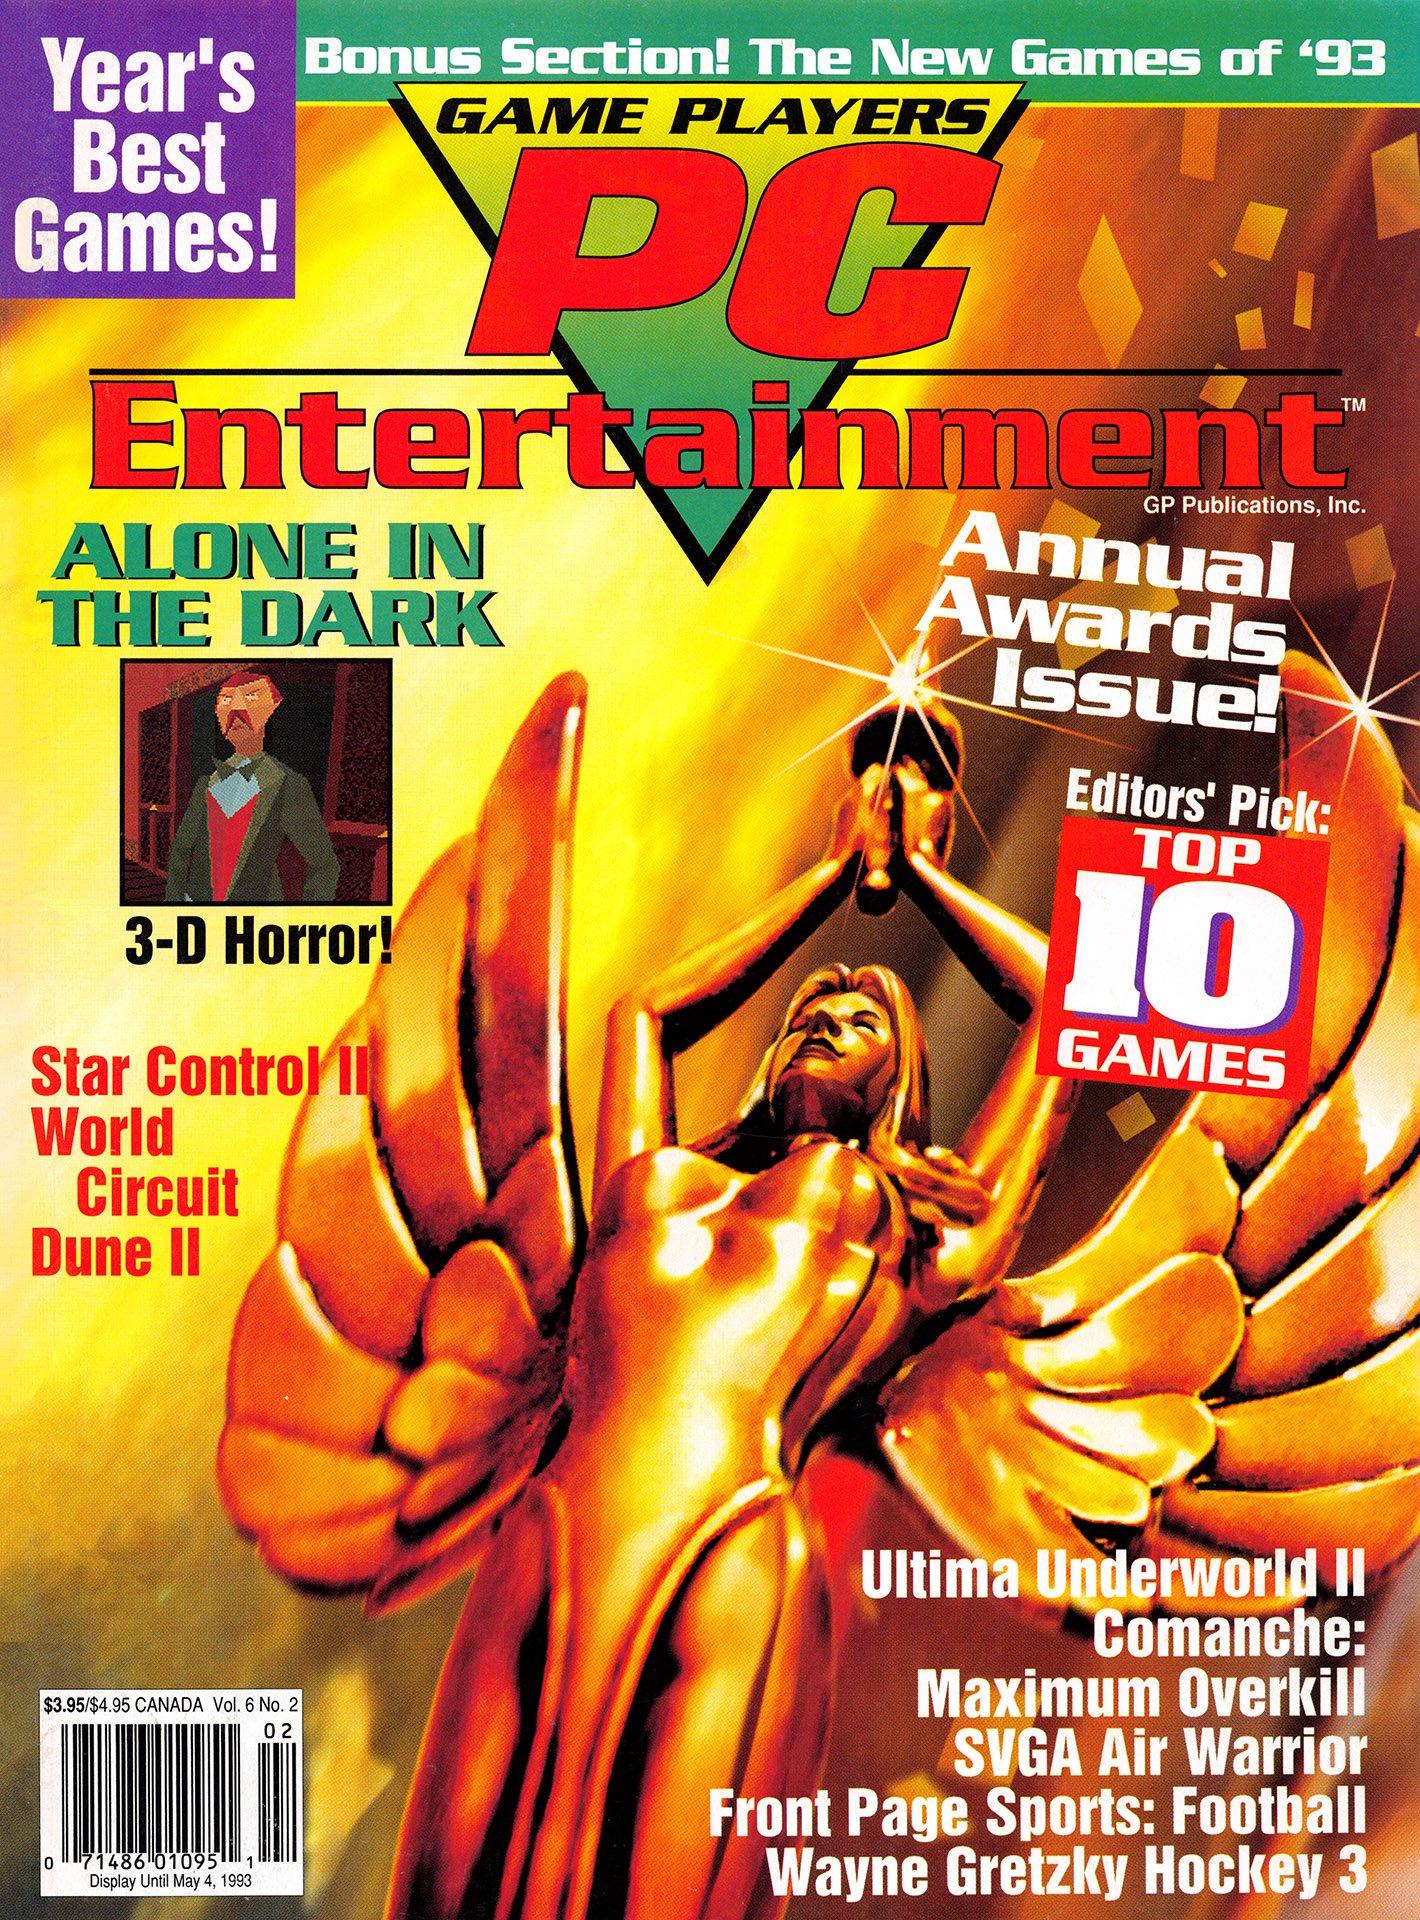 Game Players PC Entertainment Vol.6 No.2 (March/April 1993)